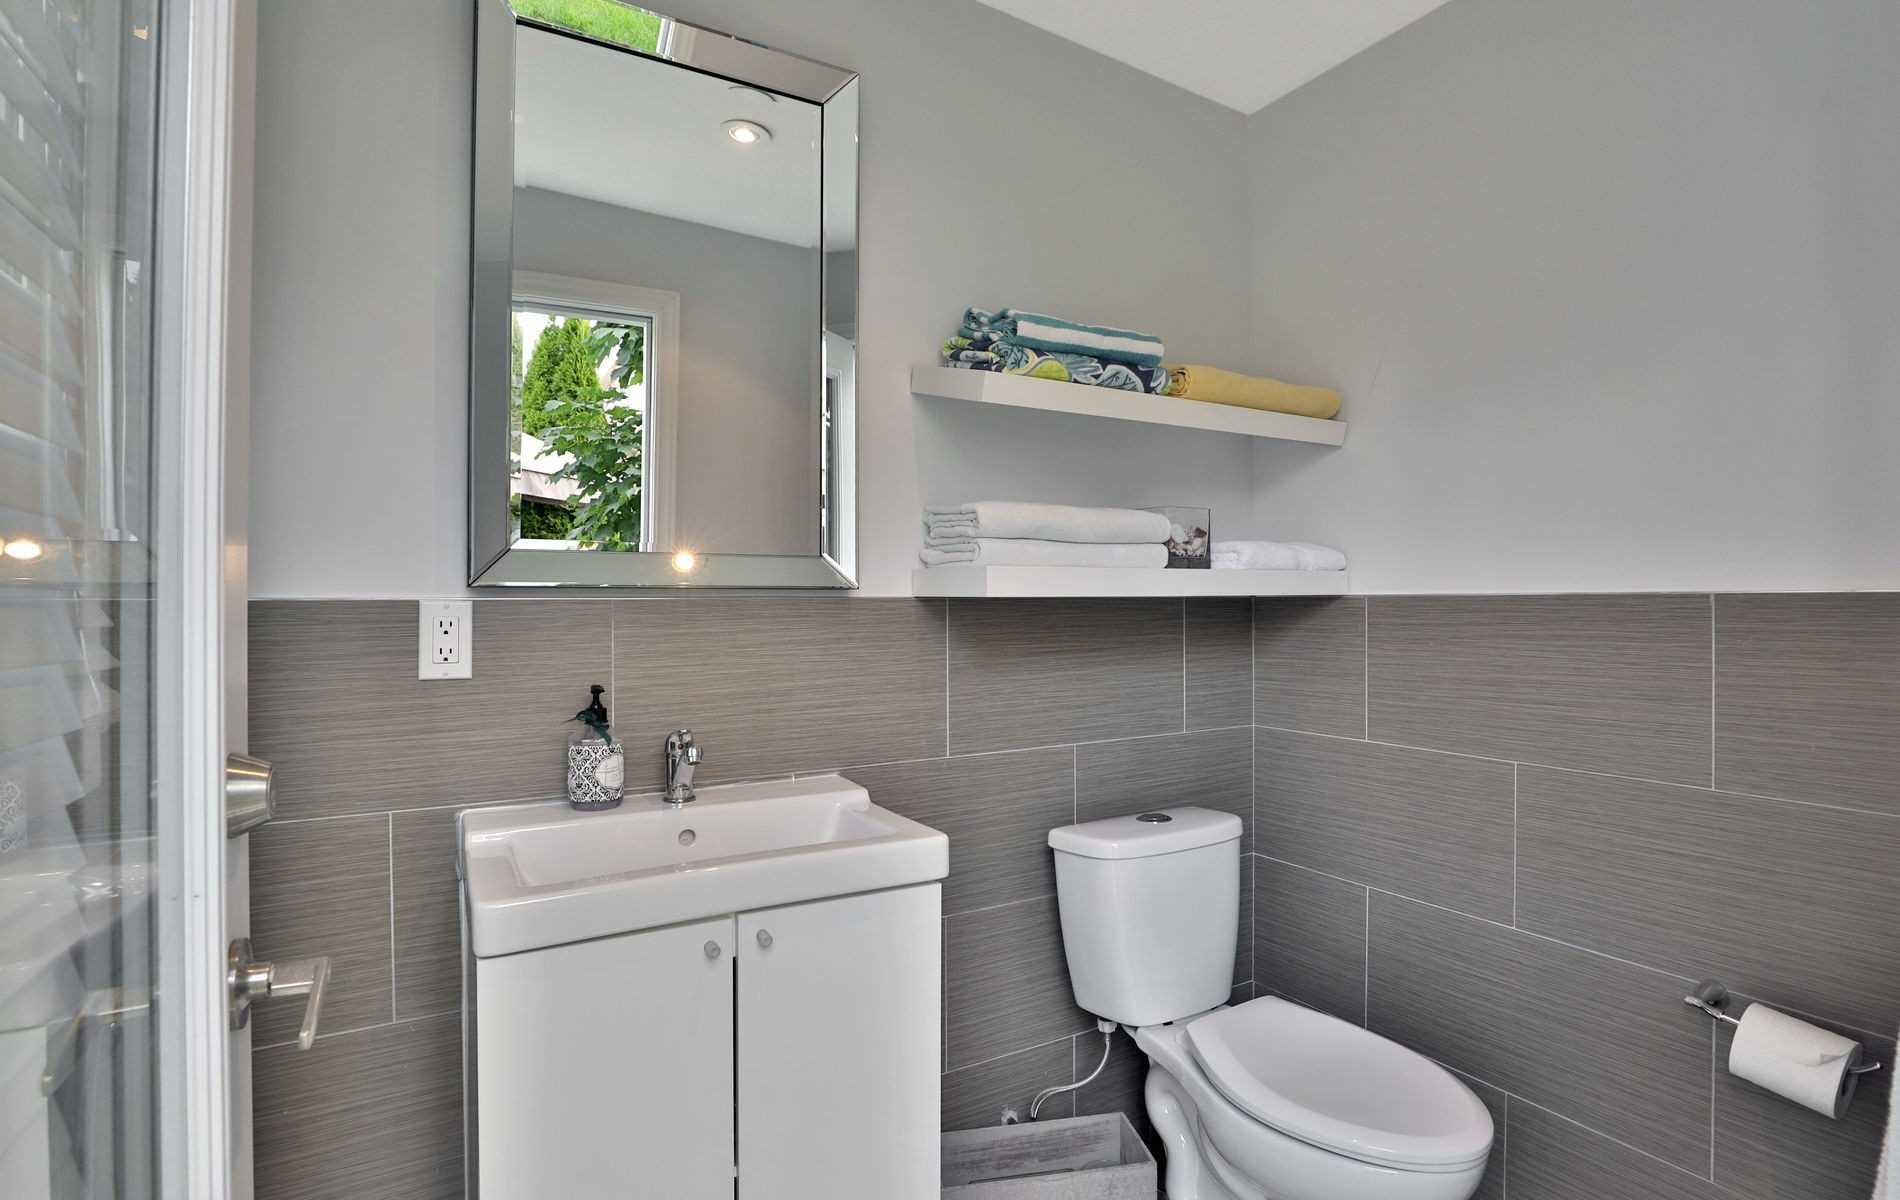 Detached house For Lease In Burlington - 4210 Sarazen Dr, Burlington, Ontario, Canada L7M 5C3 , 4 Bedrooms Bedrooms, ,5 BathroomsBathrooms,Detached,For Lease,Sarazen